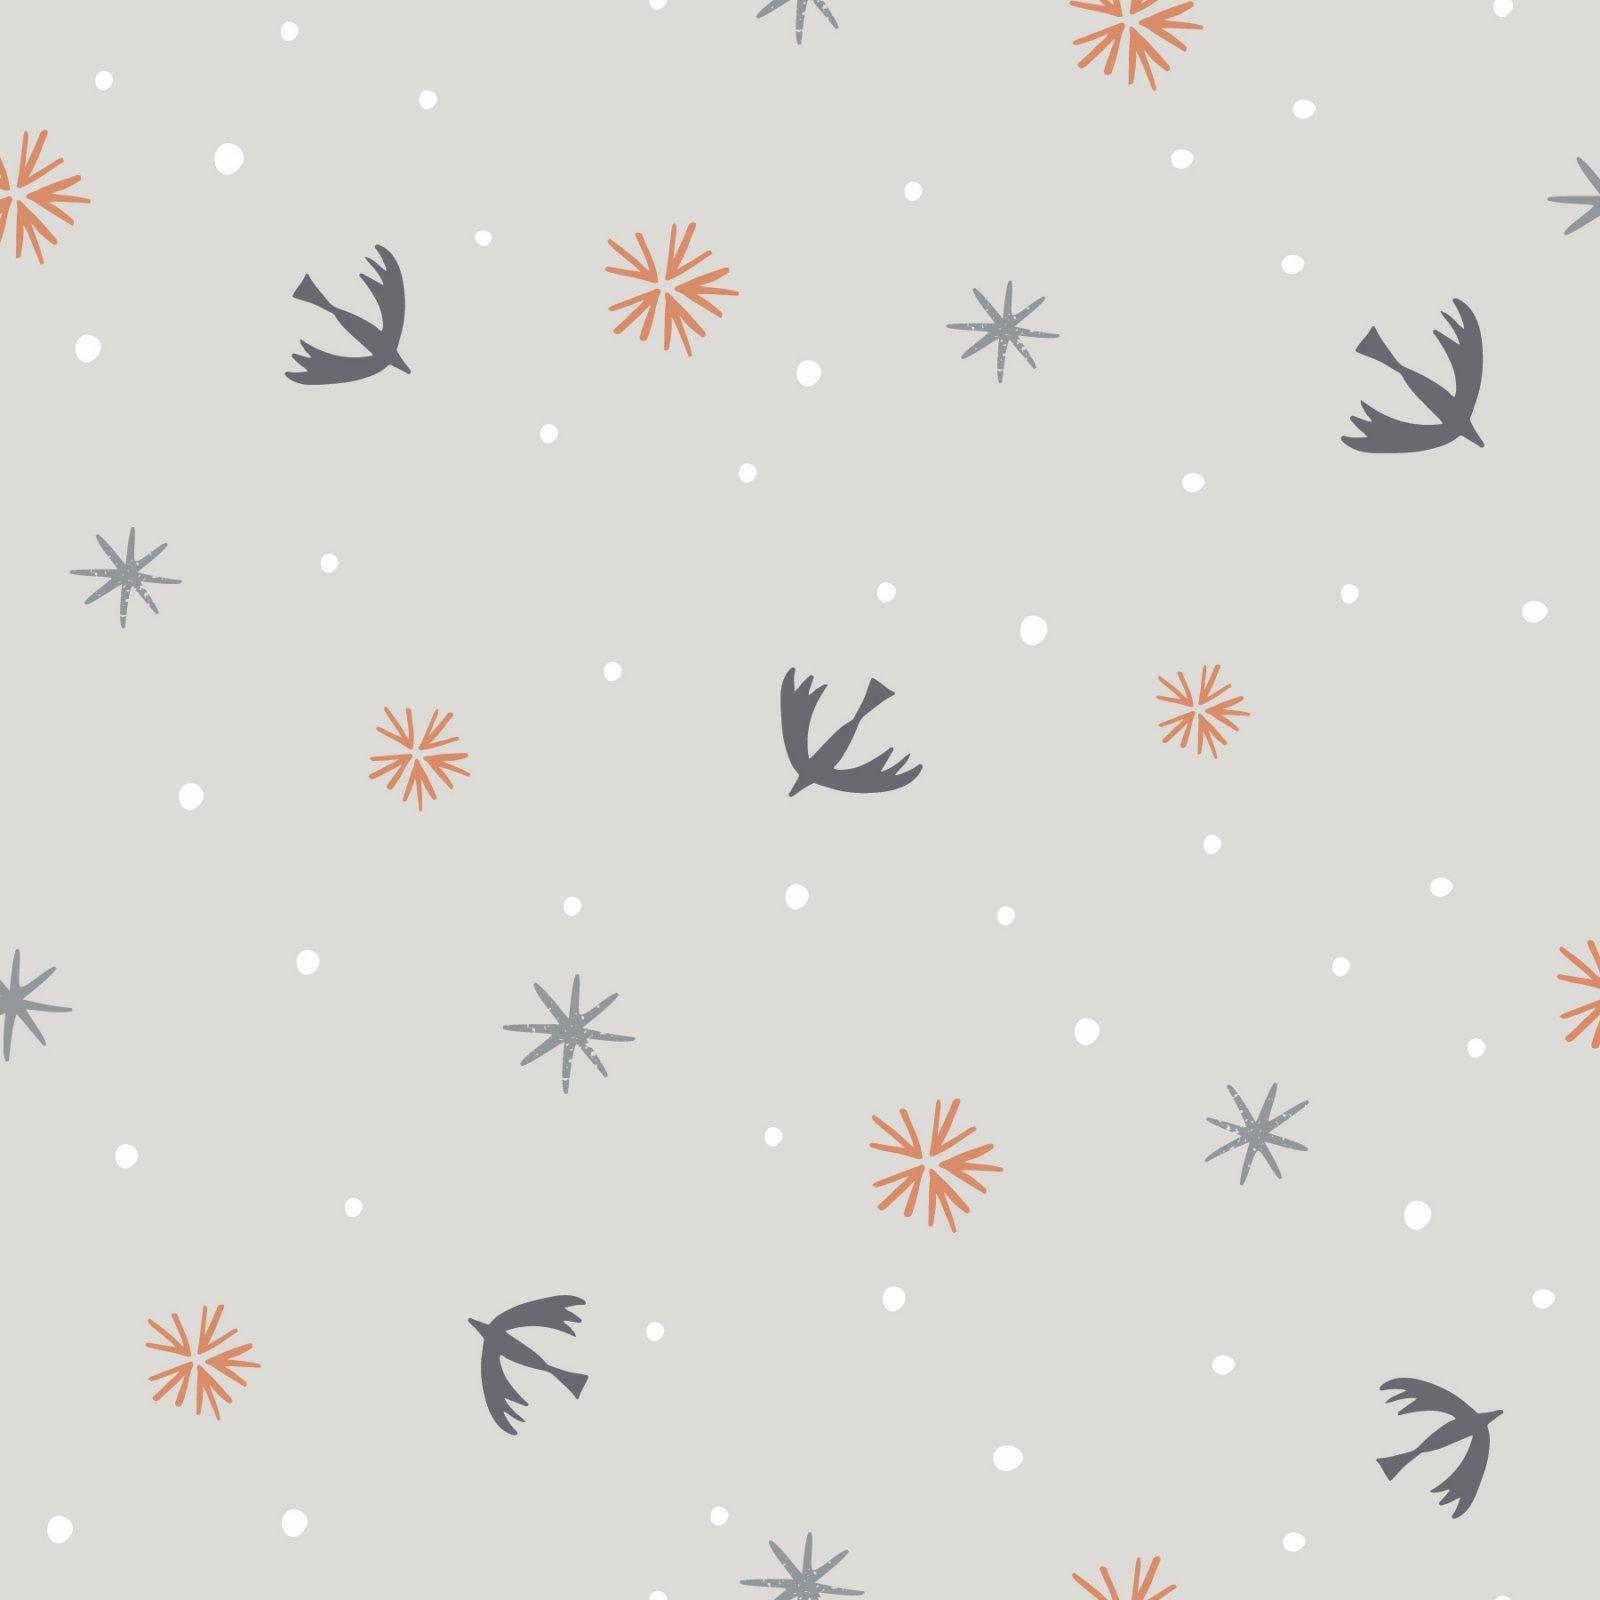 Winterfold WFLD1343/ Lt. Grey  (Birds Stars on LT. Grey)